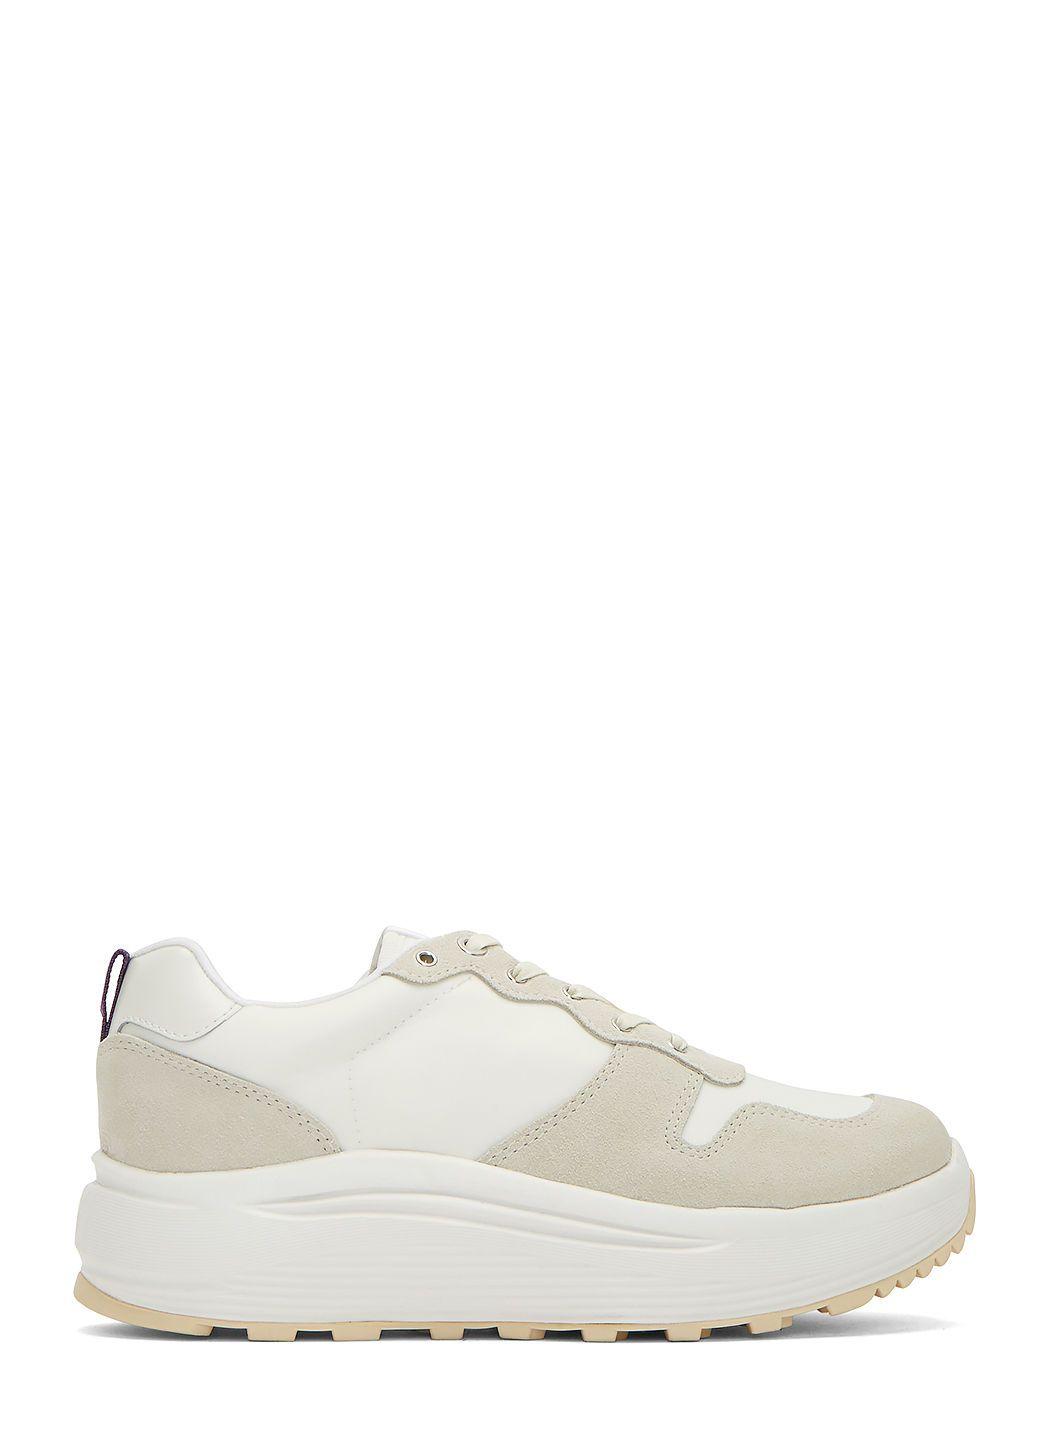 FOOTWEAR - Low-tops & sneakers Eytys bD1fi3qxI